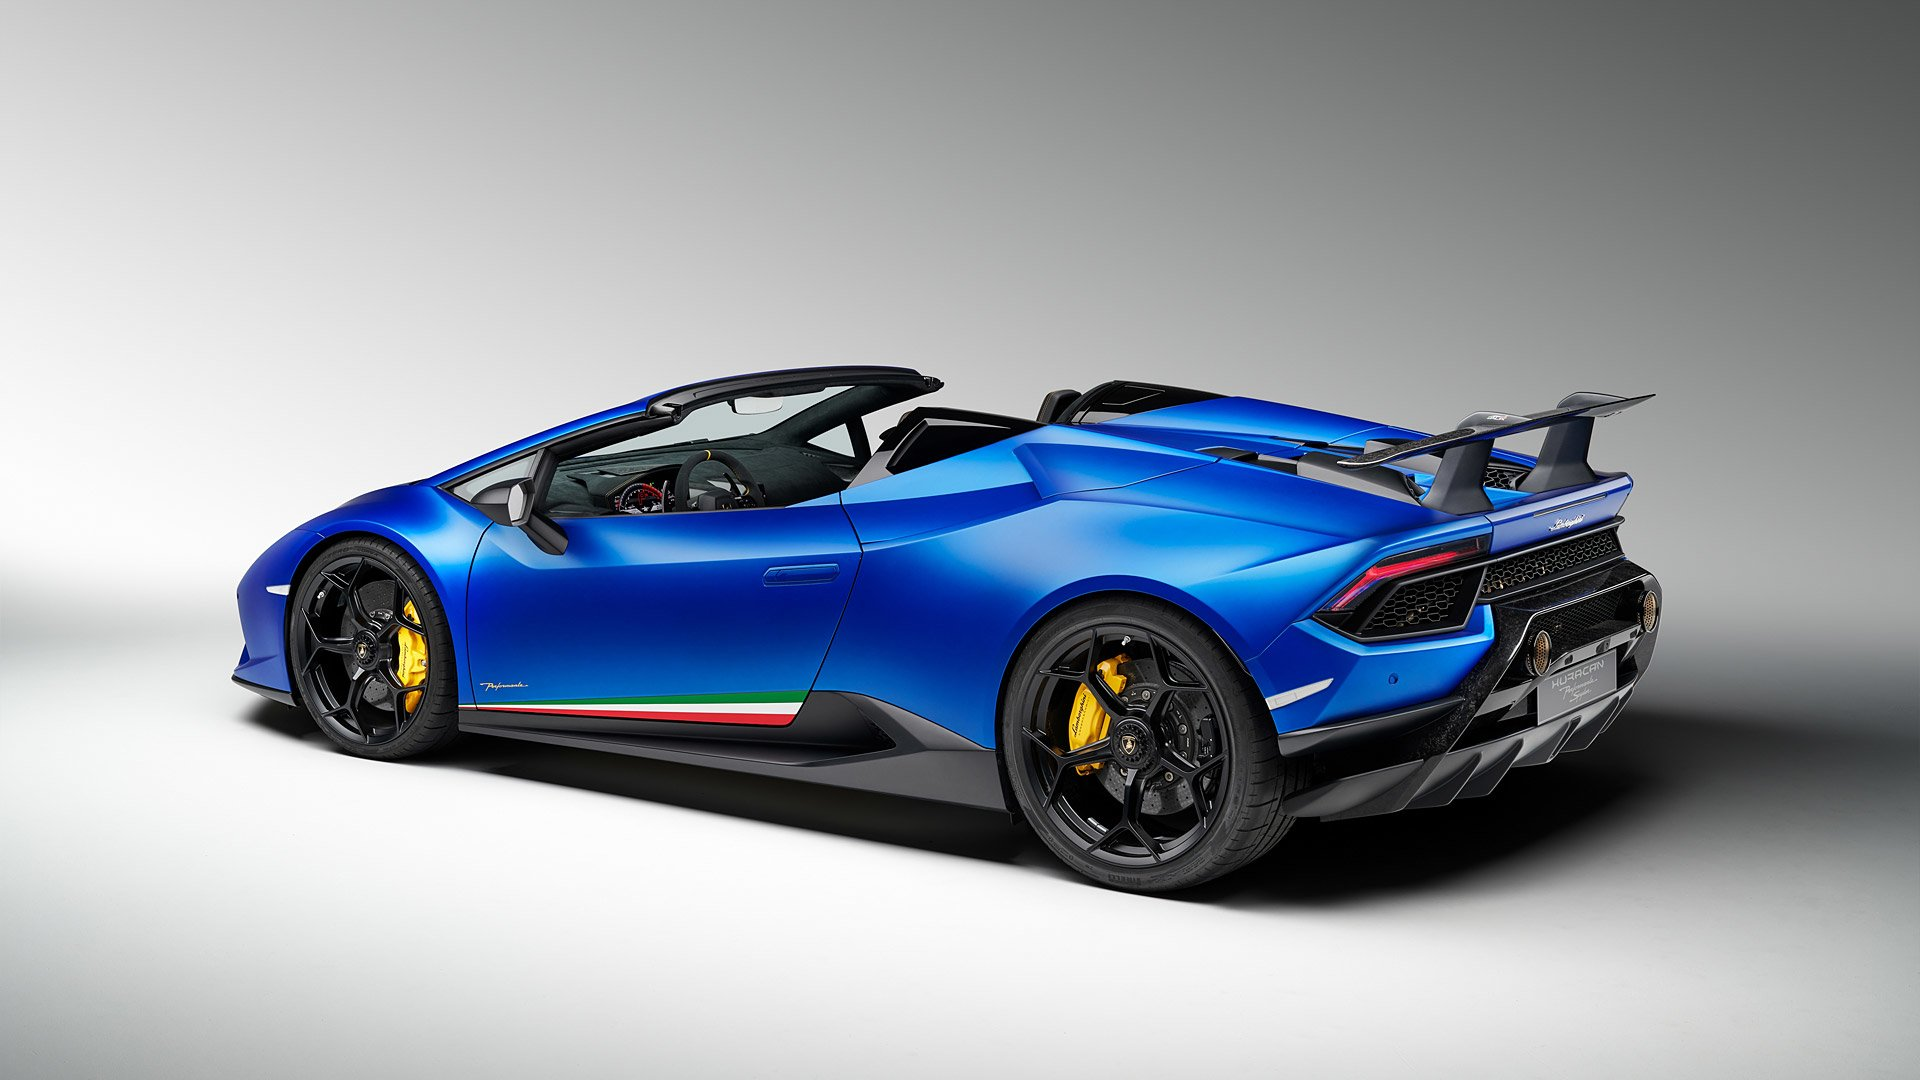 20 Lamborghini Huracan Performante Hd Wallpapers Background Images